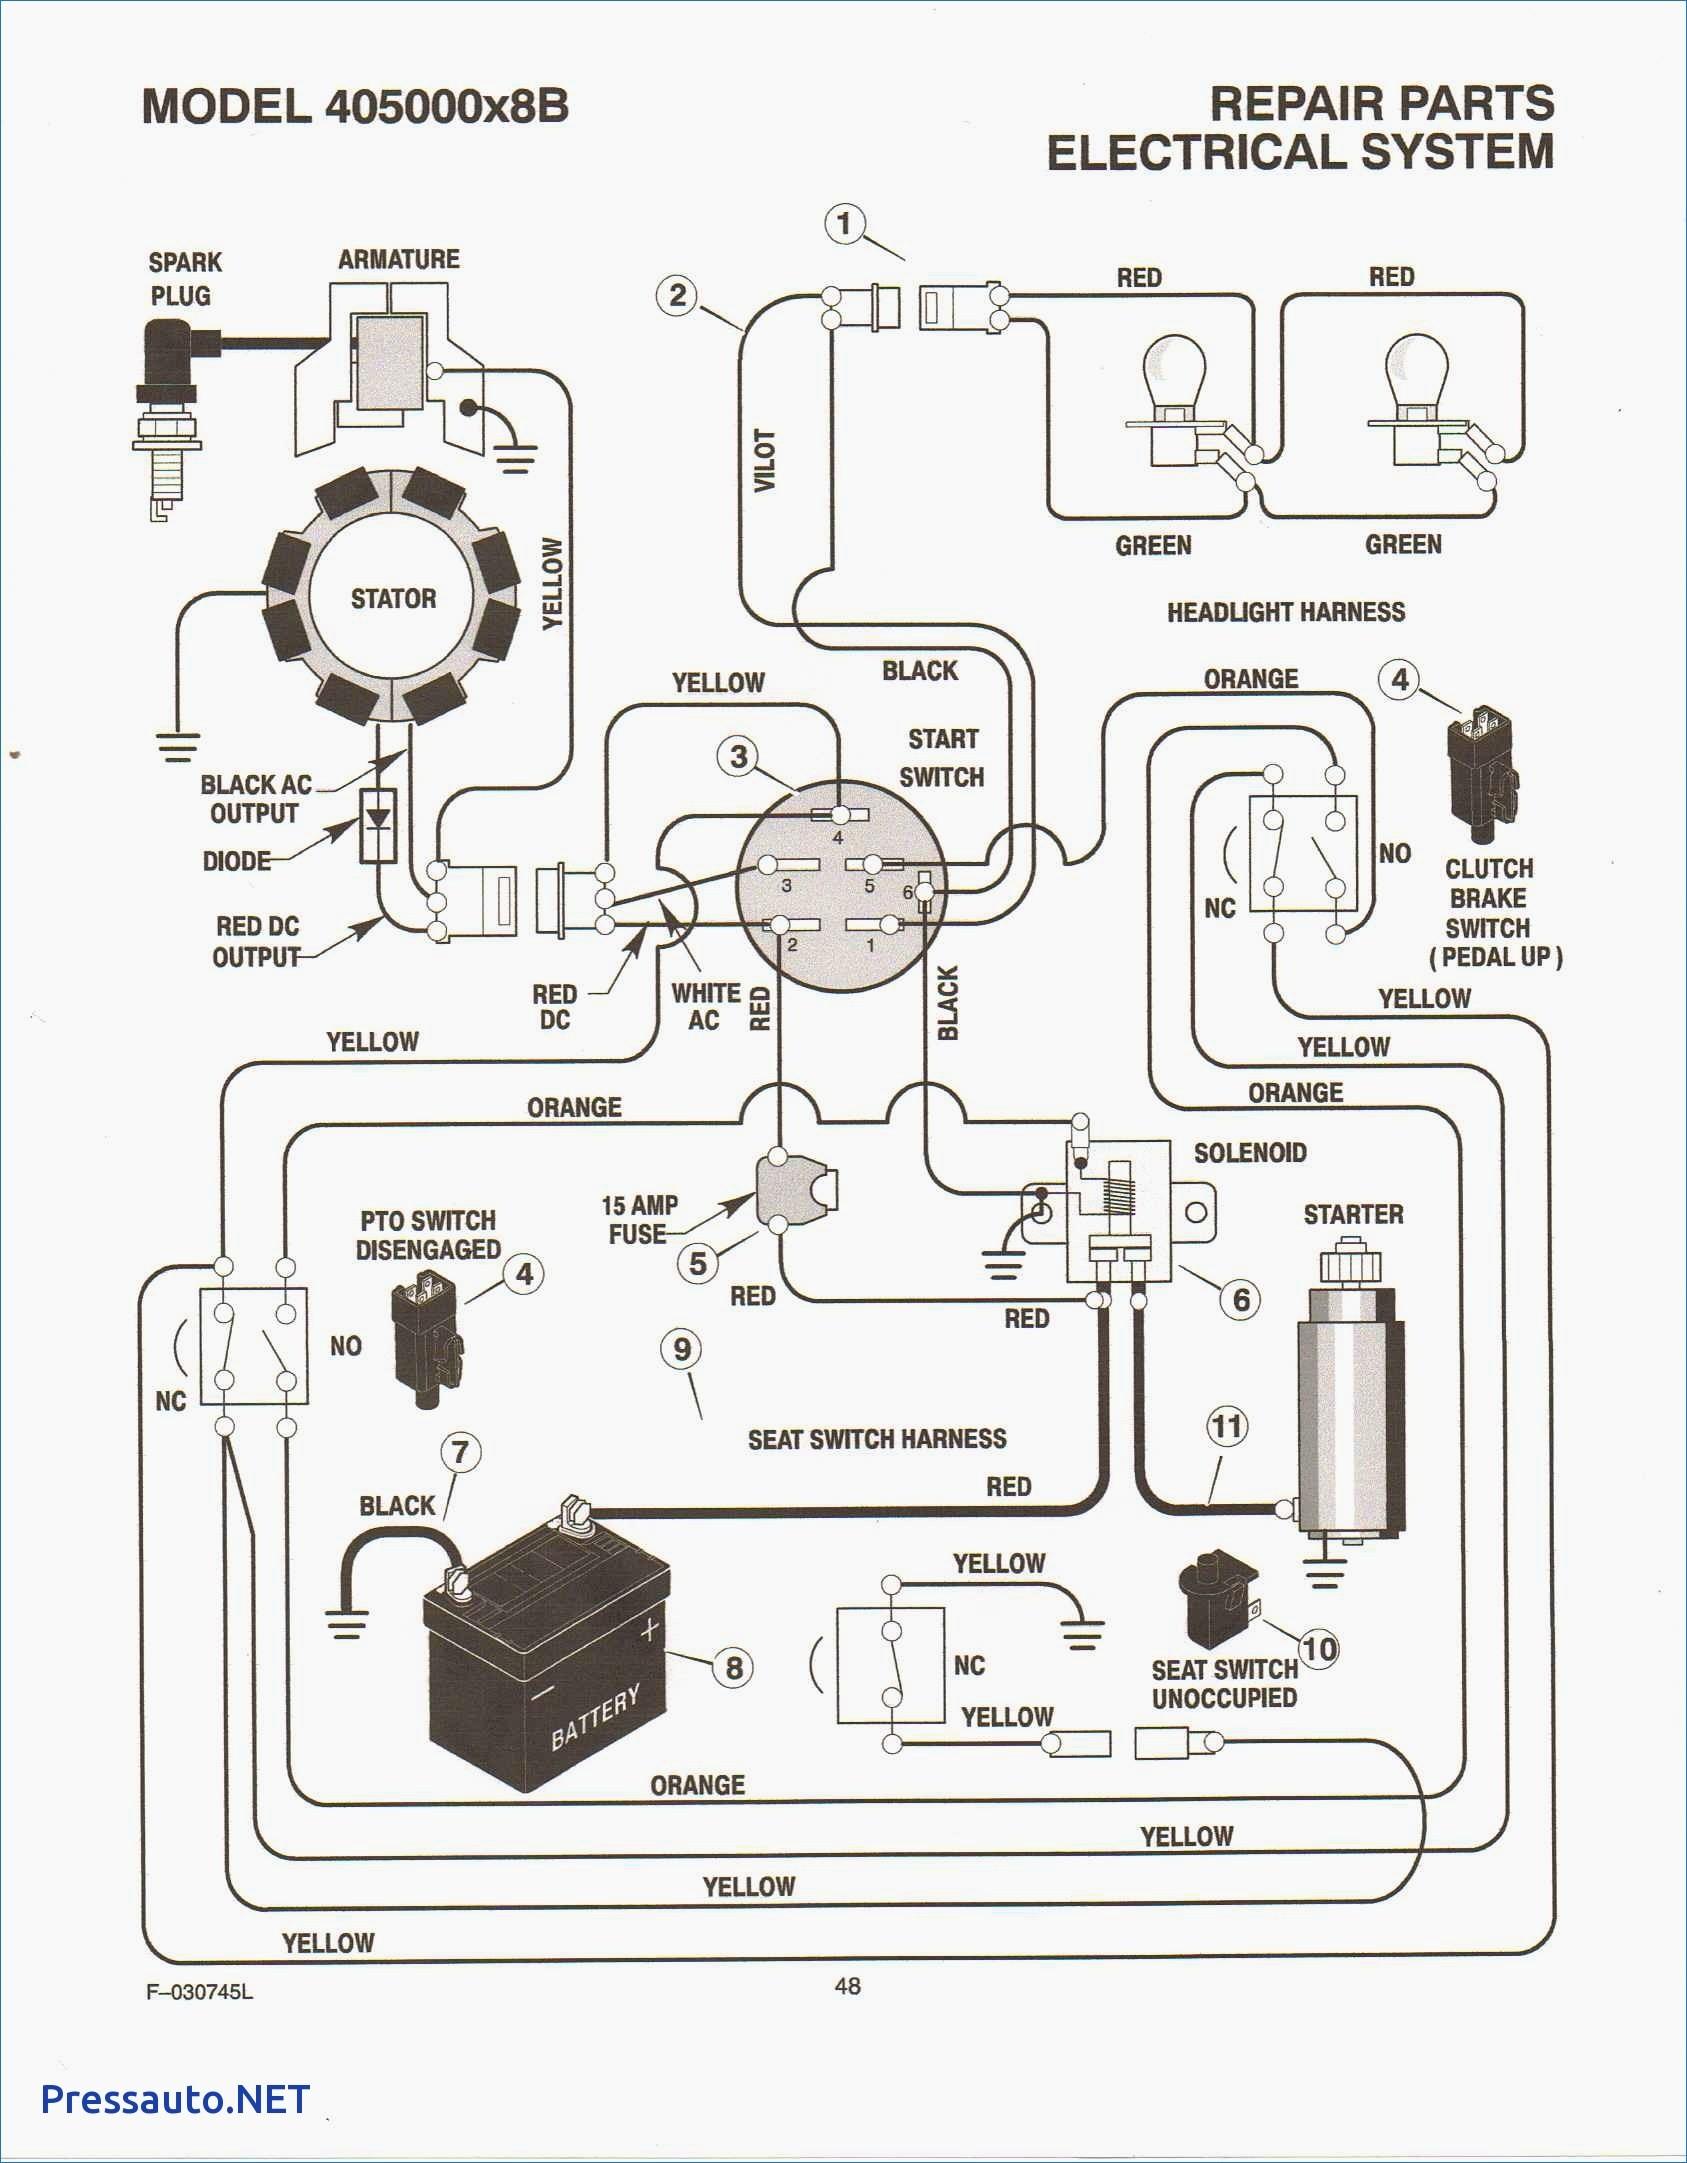 20 Hp Kohler Engine Wiring Diagram Fine Eclipse Model Cd5423 Wiring Diagram S Electrical System Of 20 Hp Kohler Engine Wiring Diagram